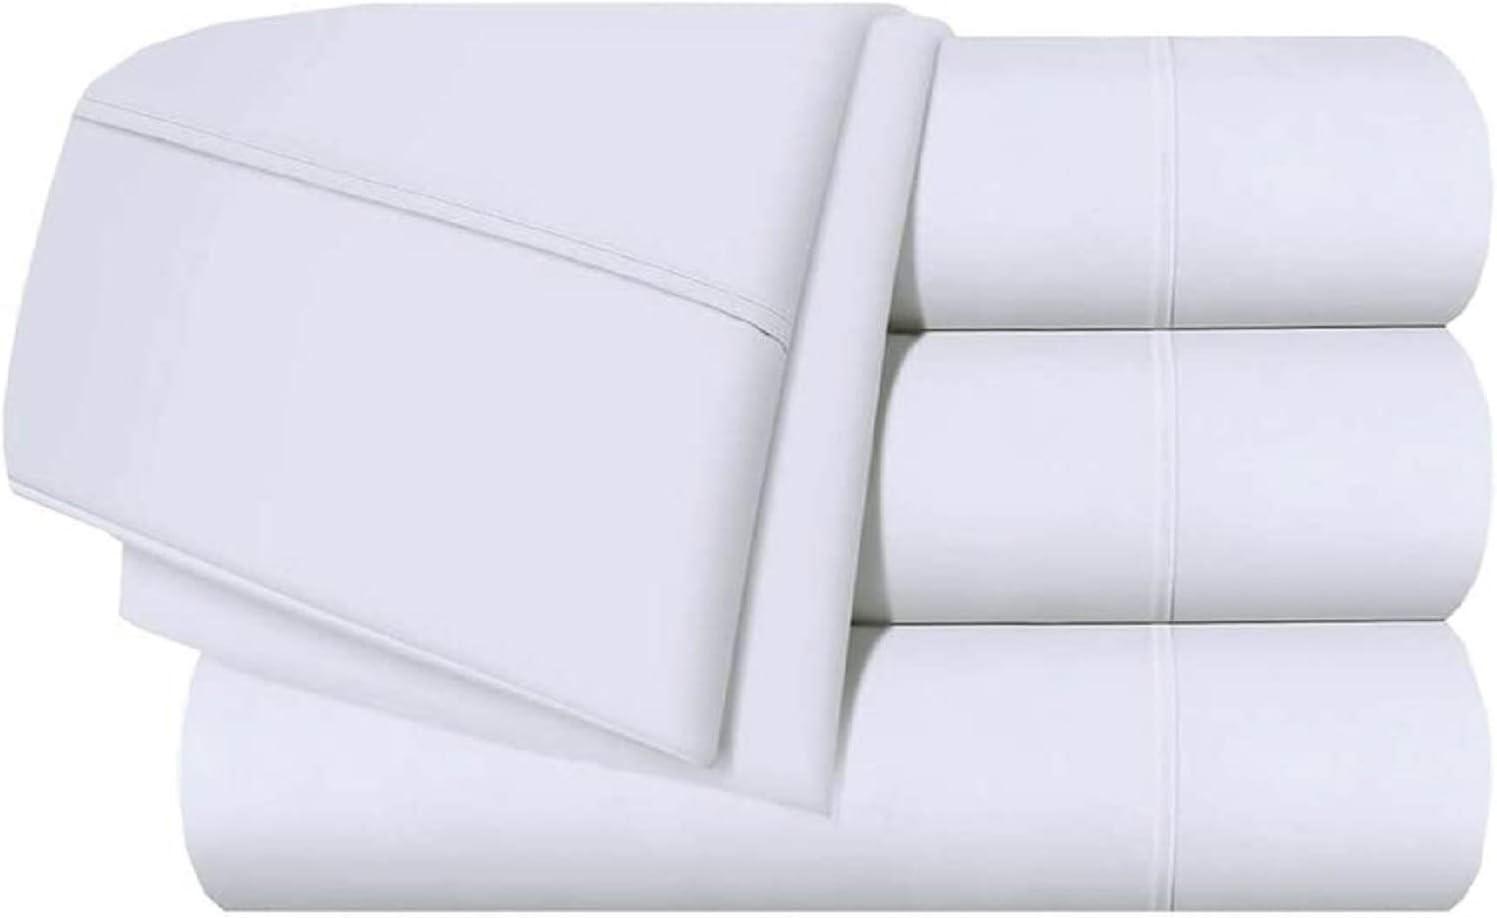 Giza Cotton Bed Sheet Set (4 PCs) 100% Certified Giza Egyptian Cotton Sheets Twin Size Giza-Sheets-Set Fits Mattress Upto 15-18'' Deep Pocket Giza Dream Sheets (Twin, White)